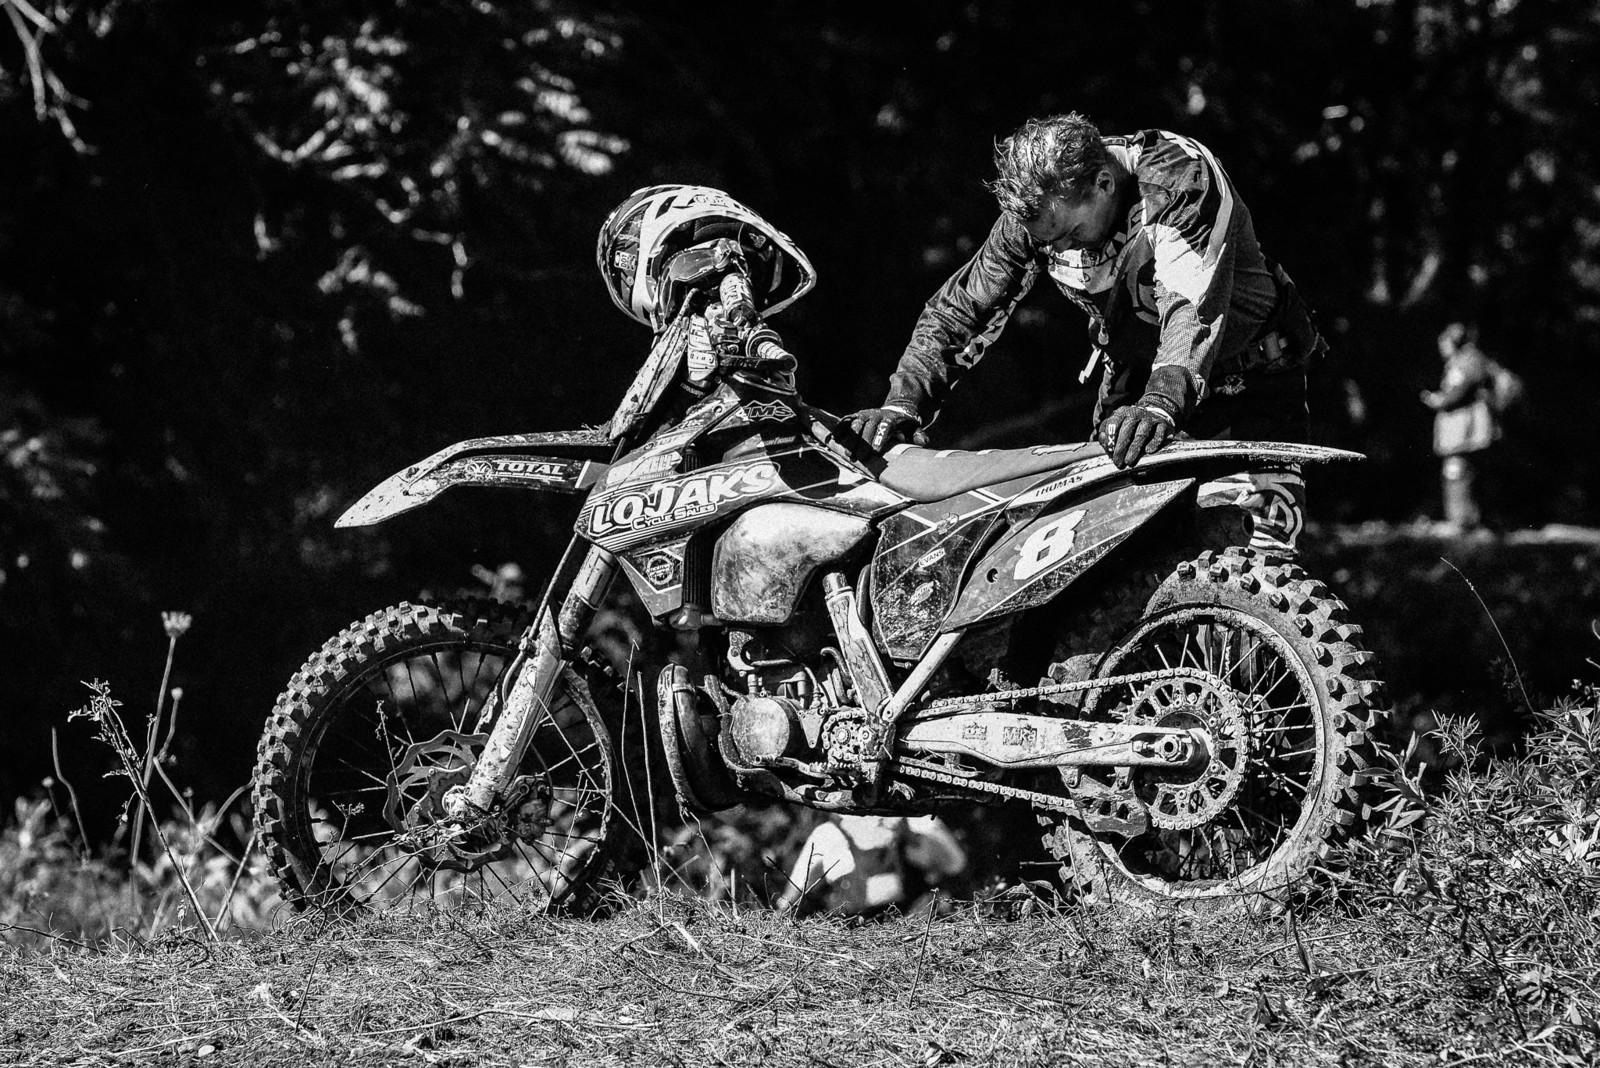 Jason Thomas - Unadilla GNCC - Motocross Pictures - Vital MX